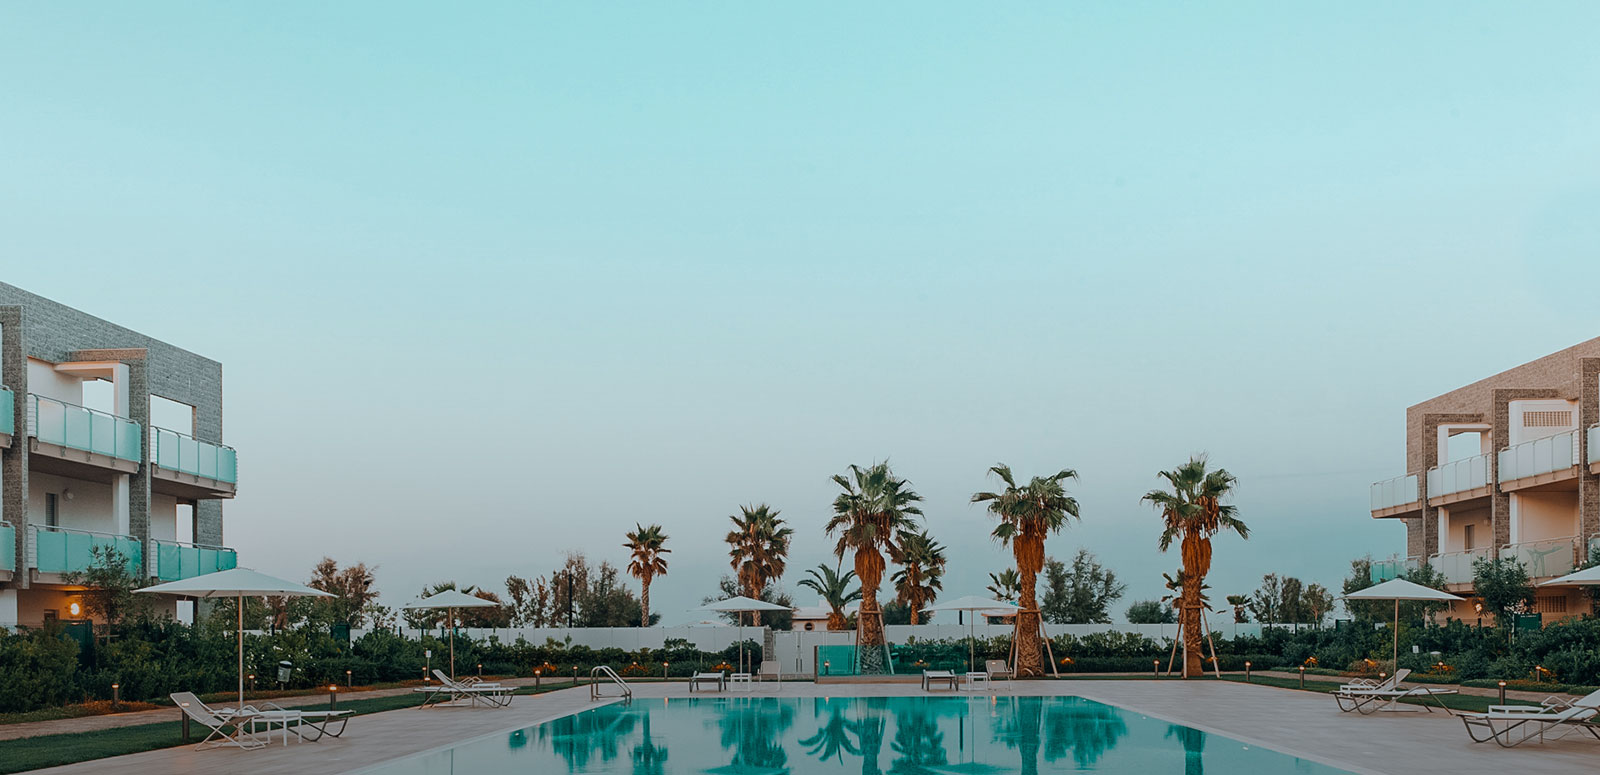 esterni-silvi-marina-piscina-le-dune-relax-comfort